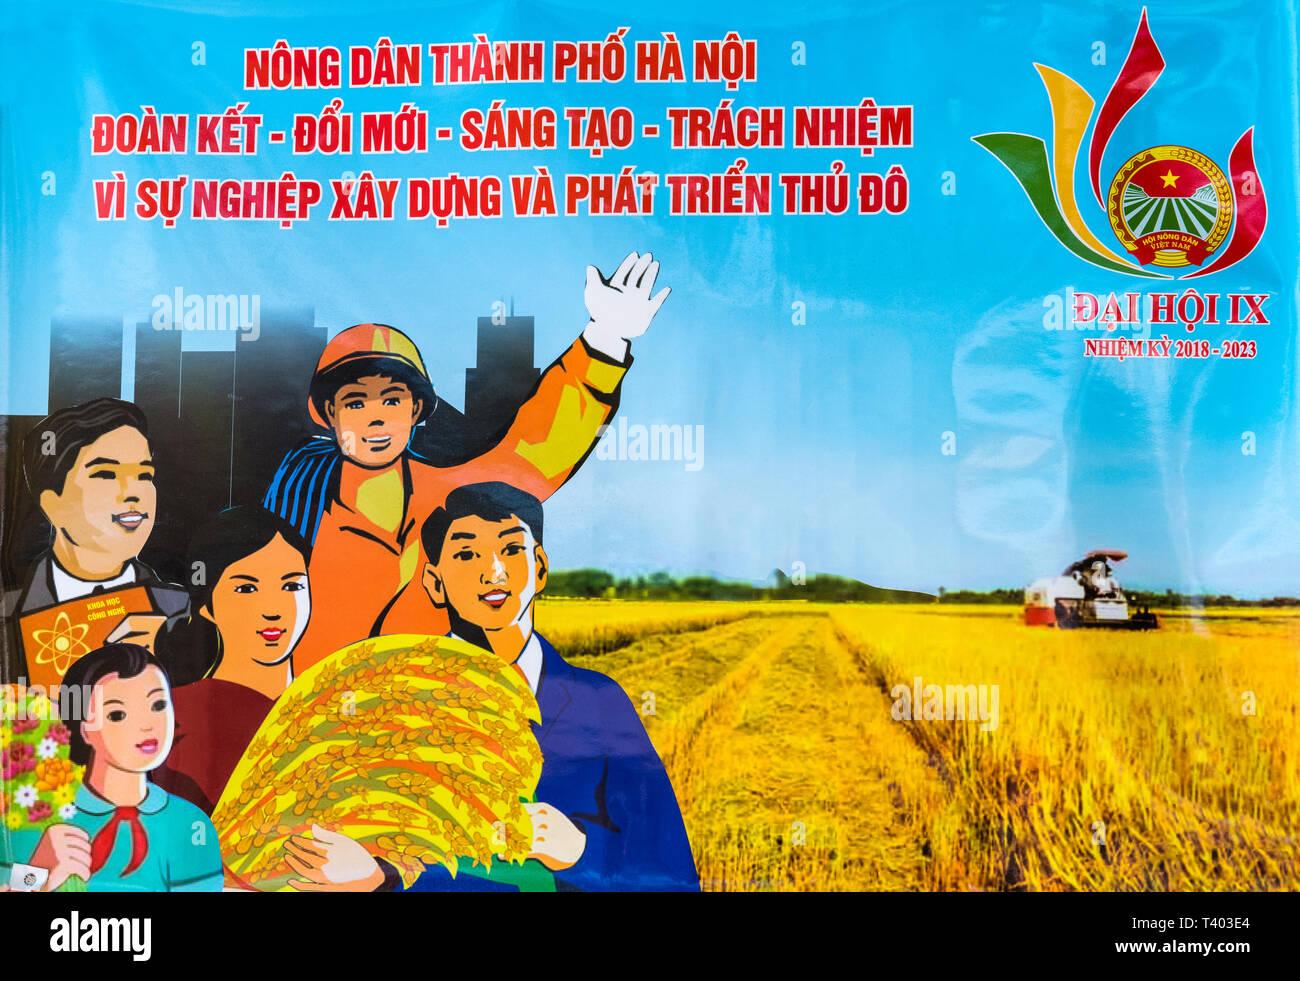 A communist propaganda poster, Hanoi, Vietnam - Stock Image